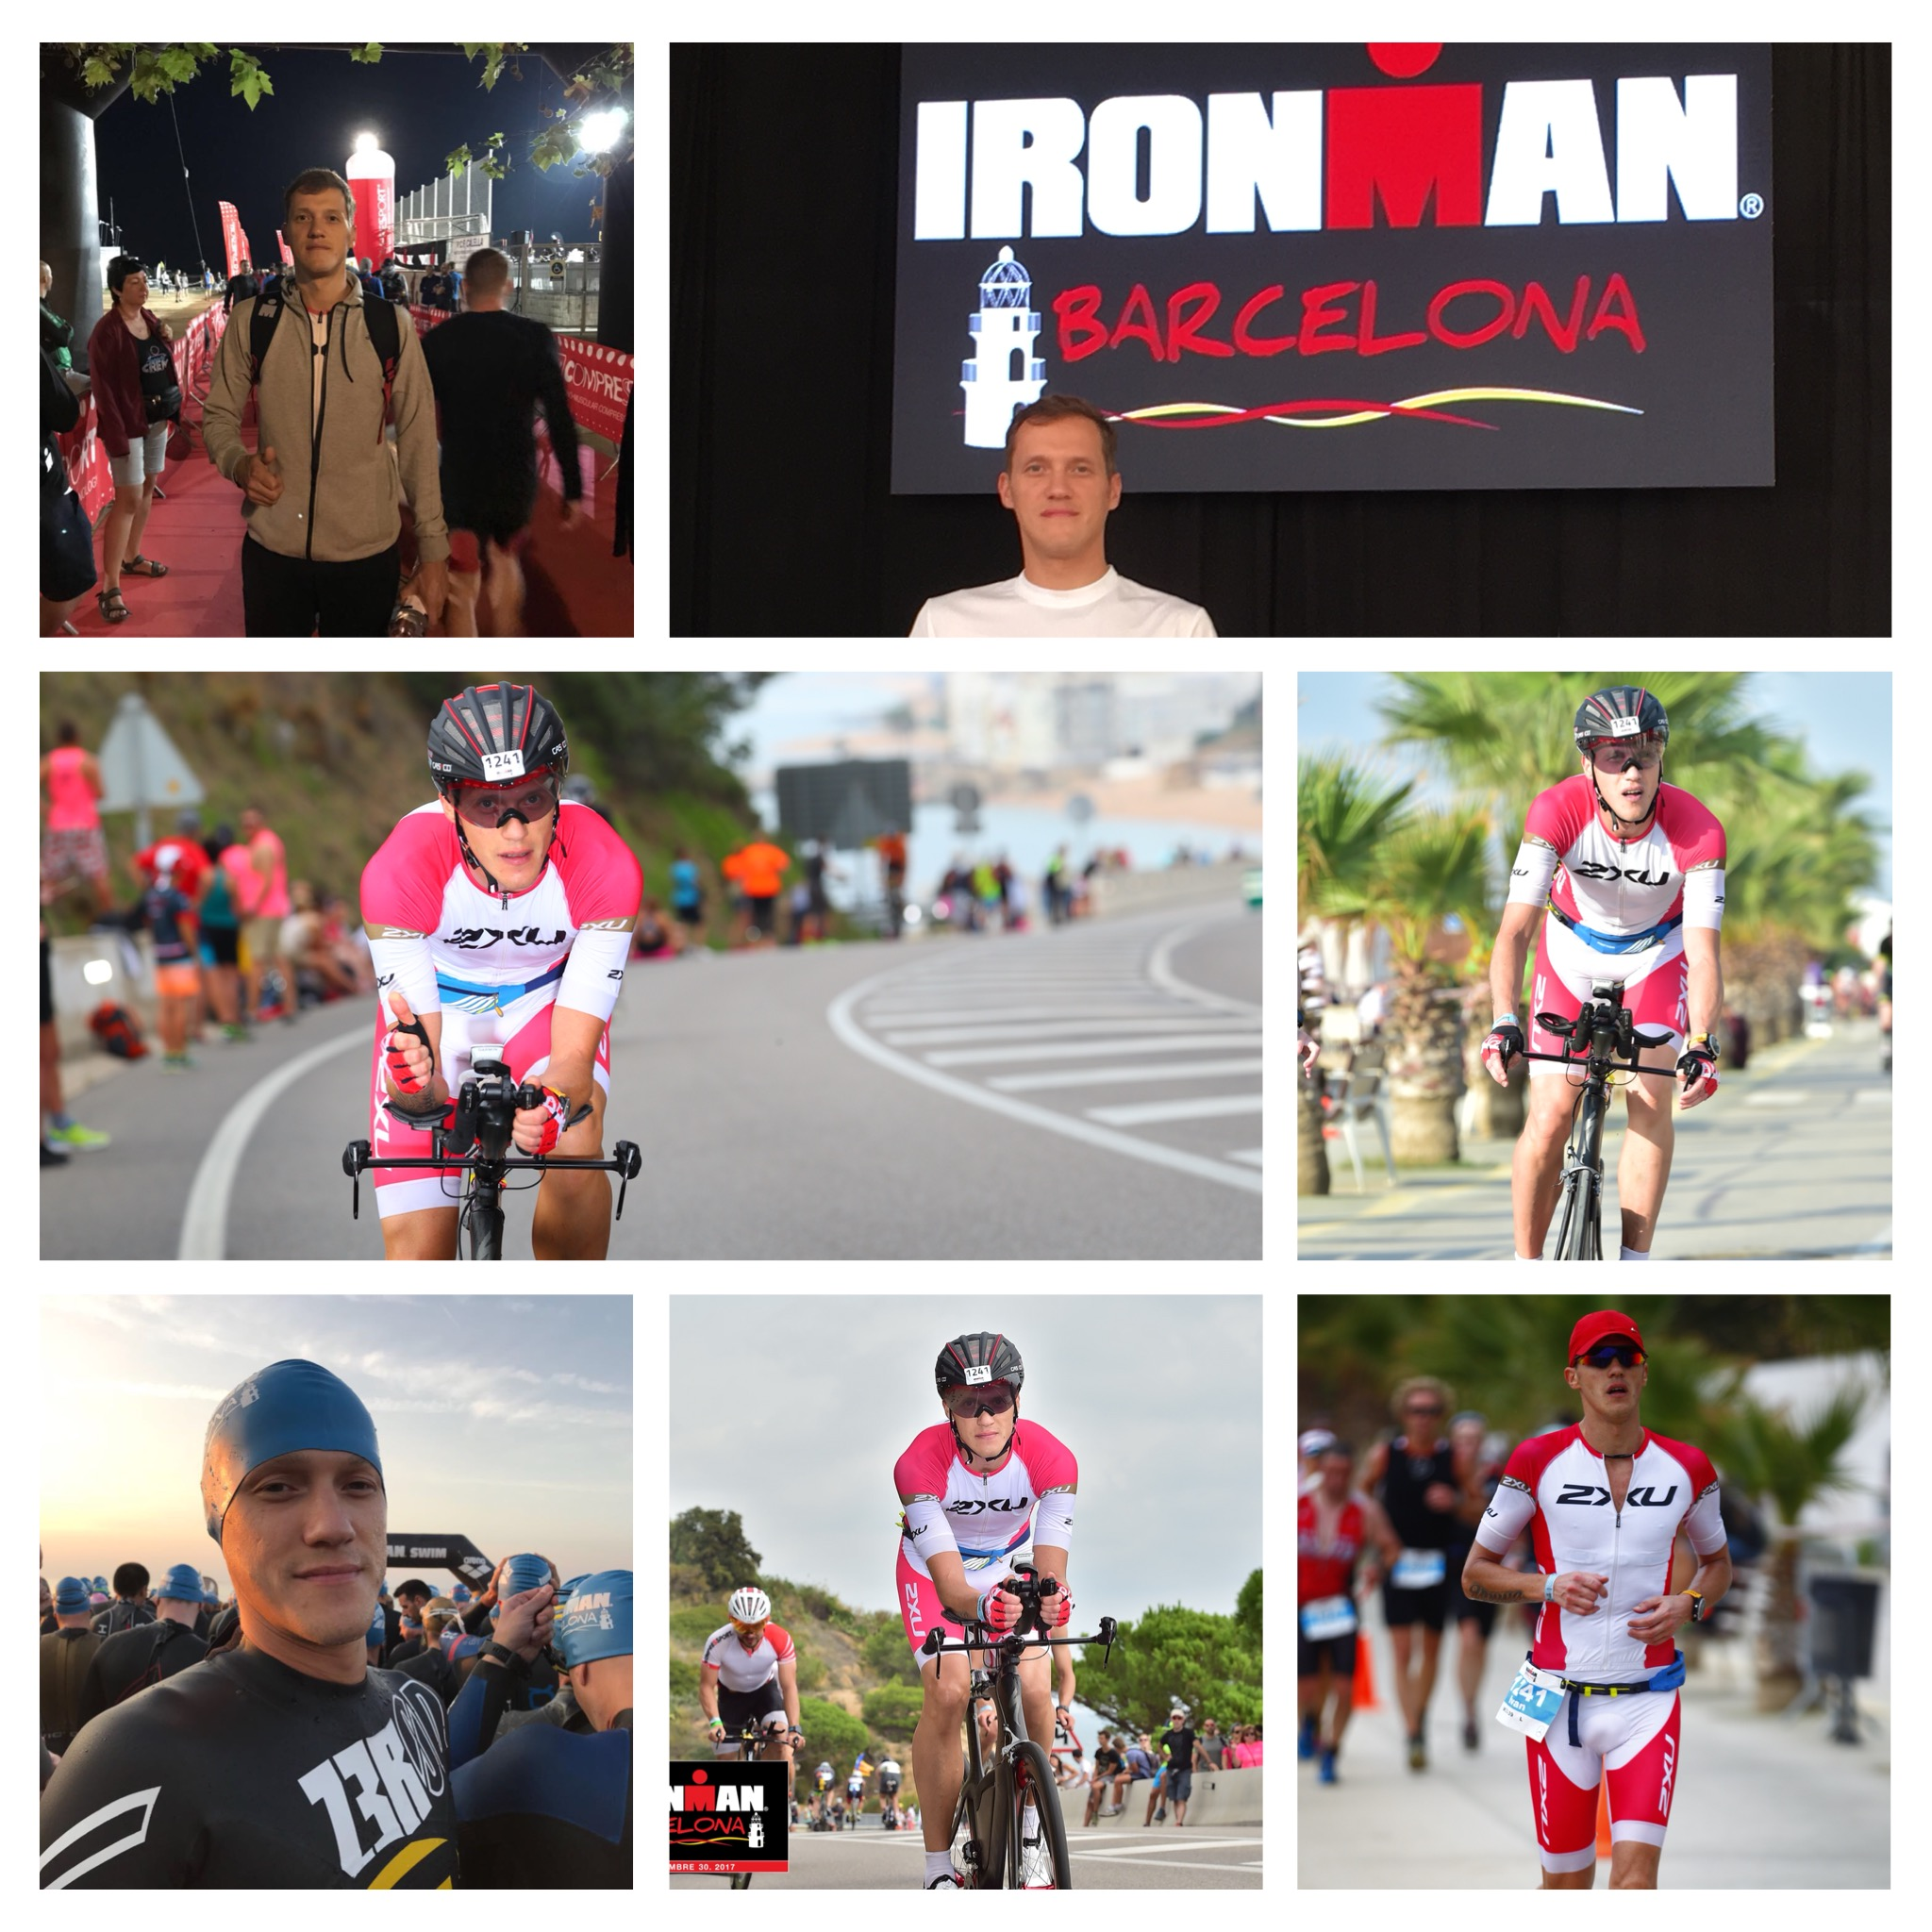 Коллаж с Ironman Barcelona